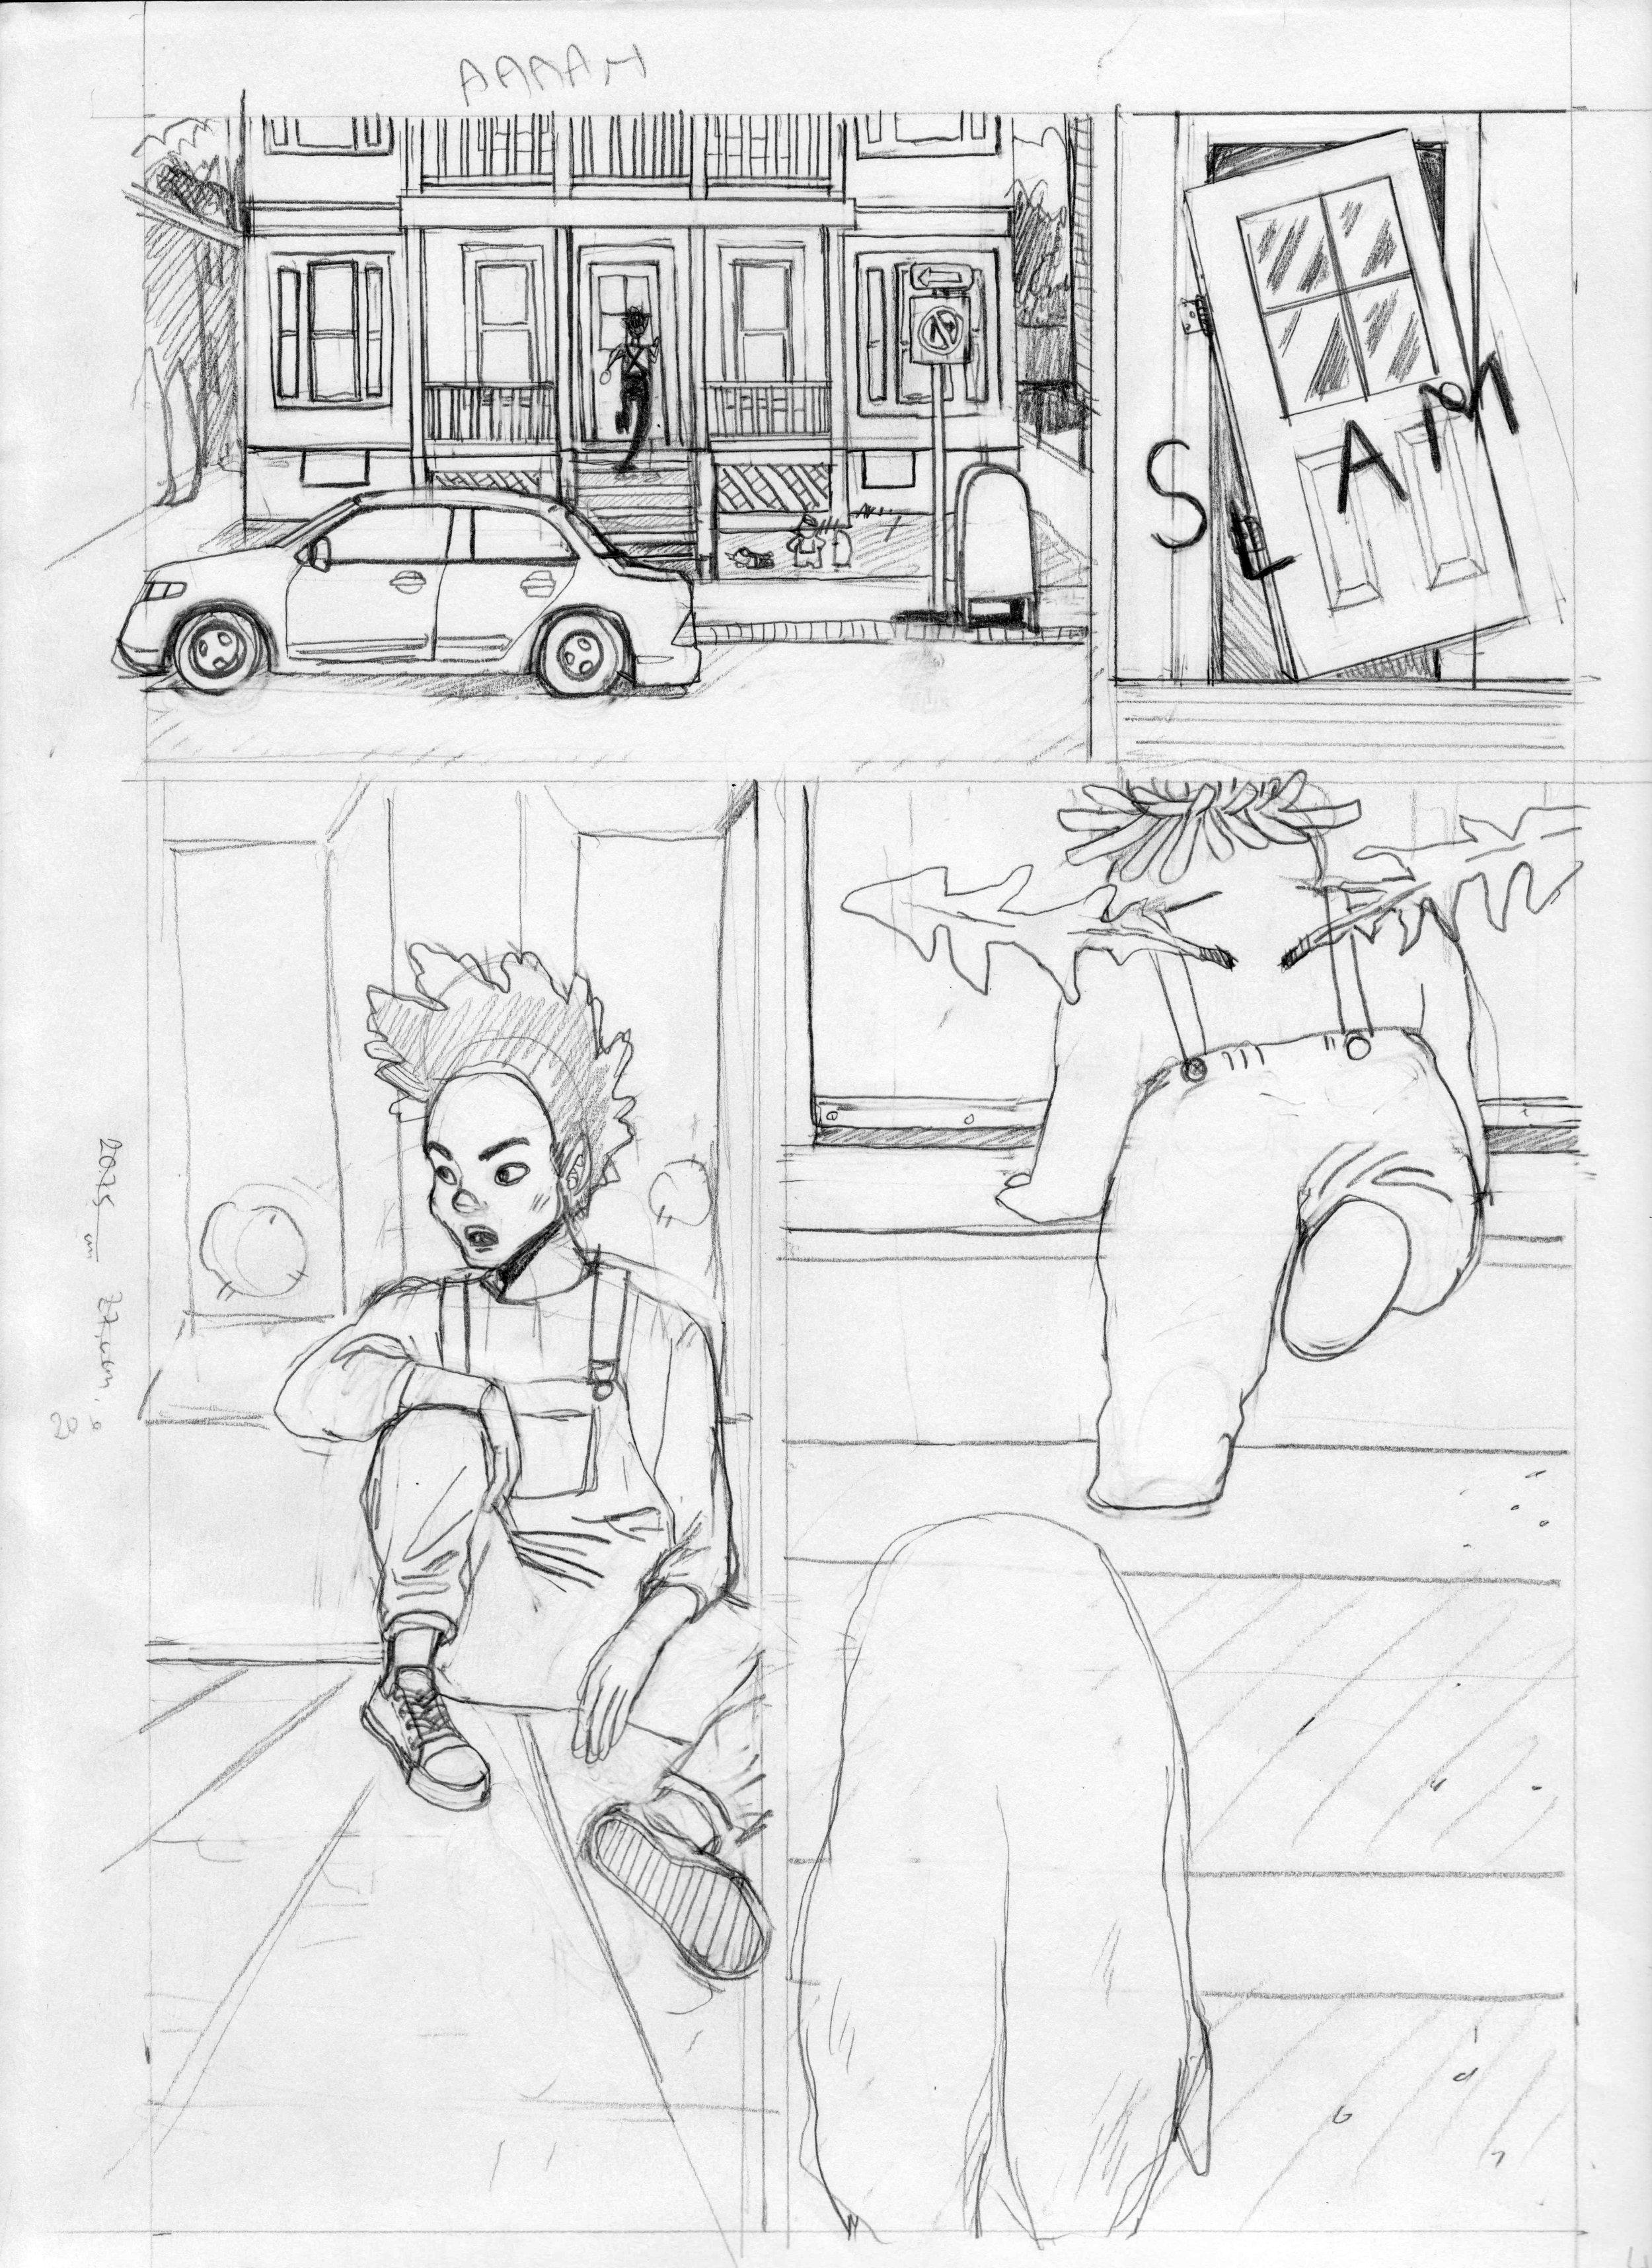 Unwanted Pencils 2018   Story by Sunny Ôchumuck  neepawus.tumblr.com   Inks by Shaina Lu  shainadoesart.com